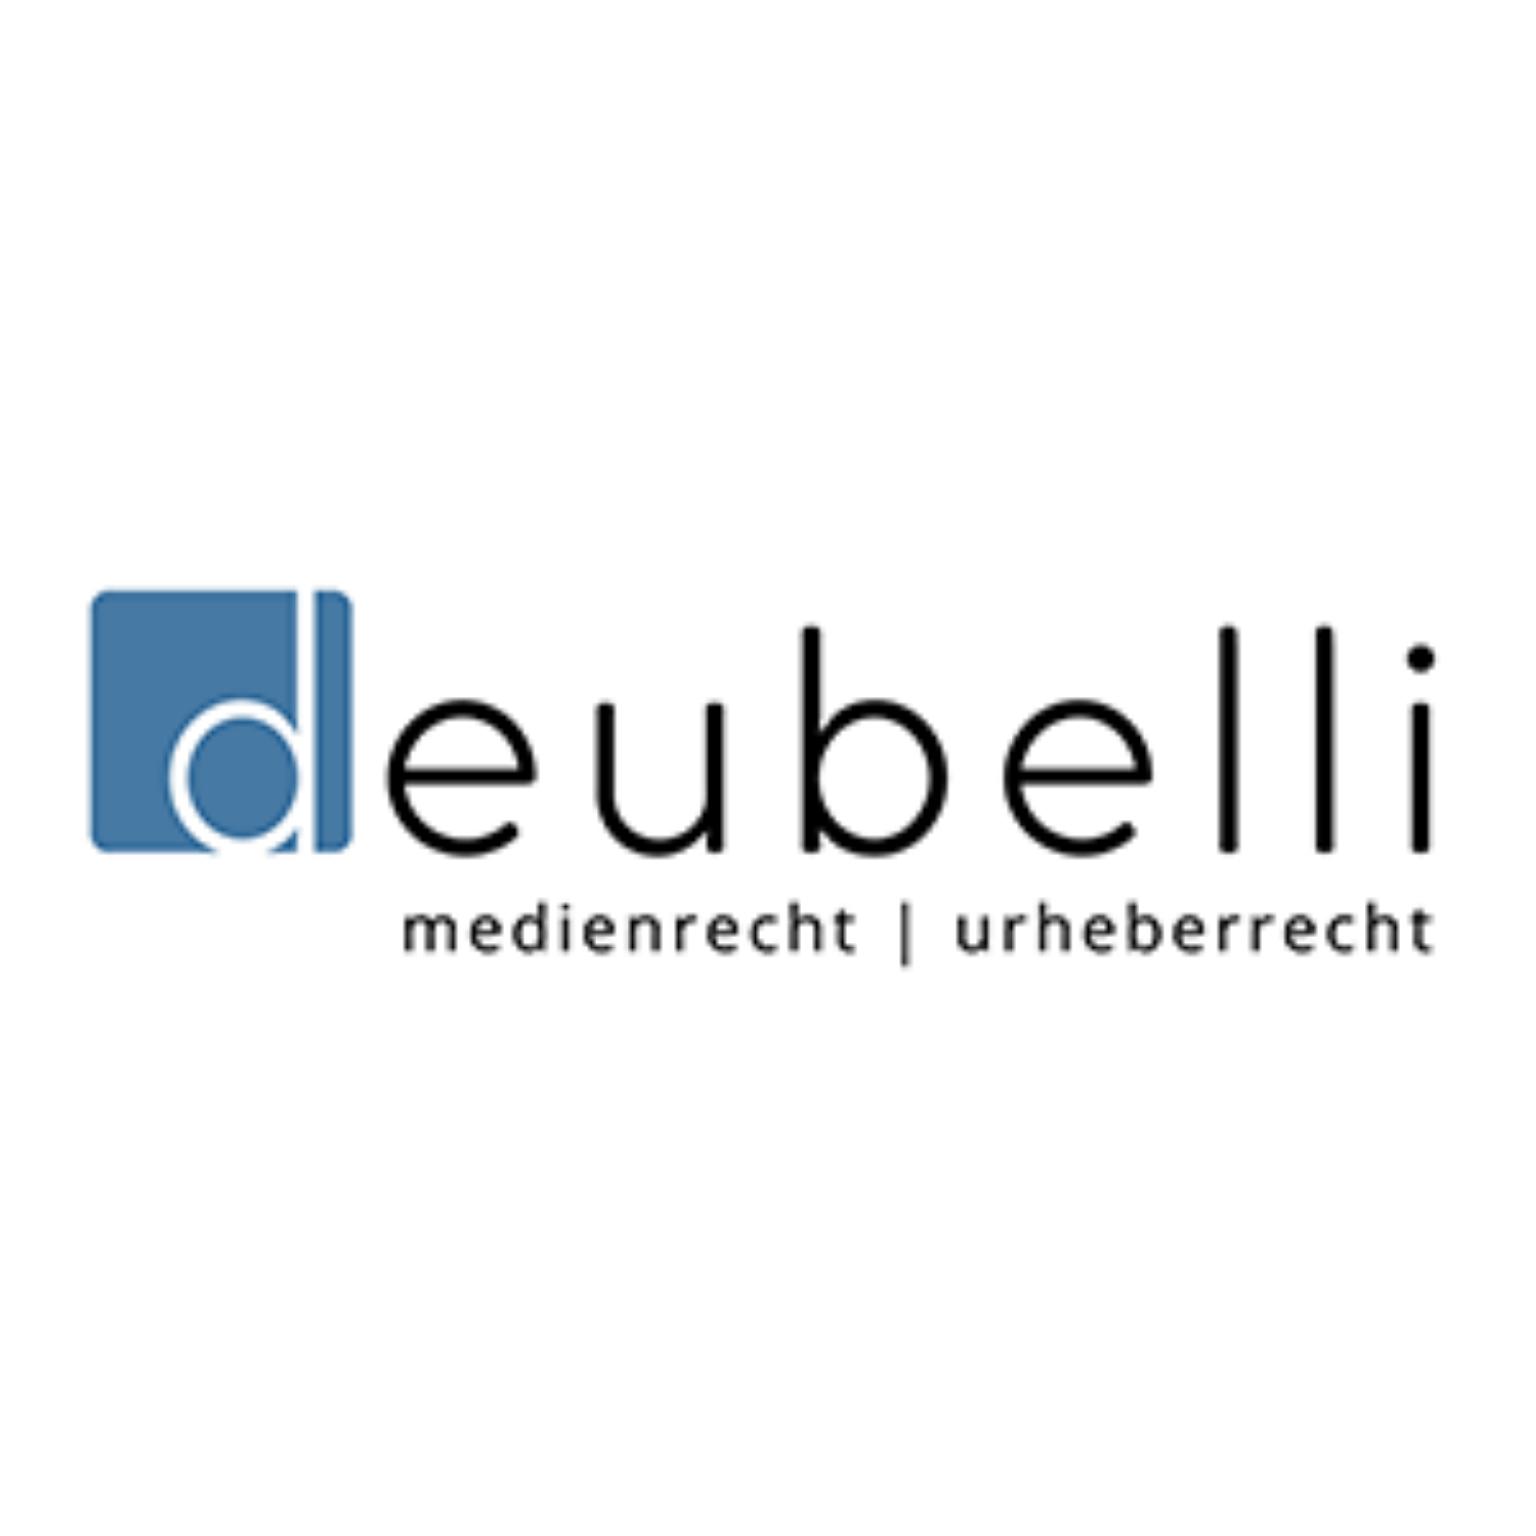 Sebastian Deubelli – Kanzlei Deubelli